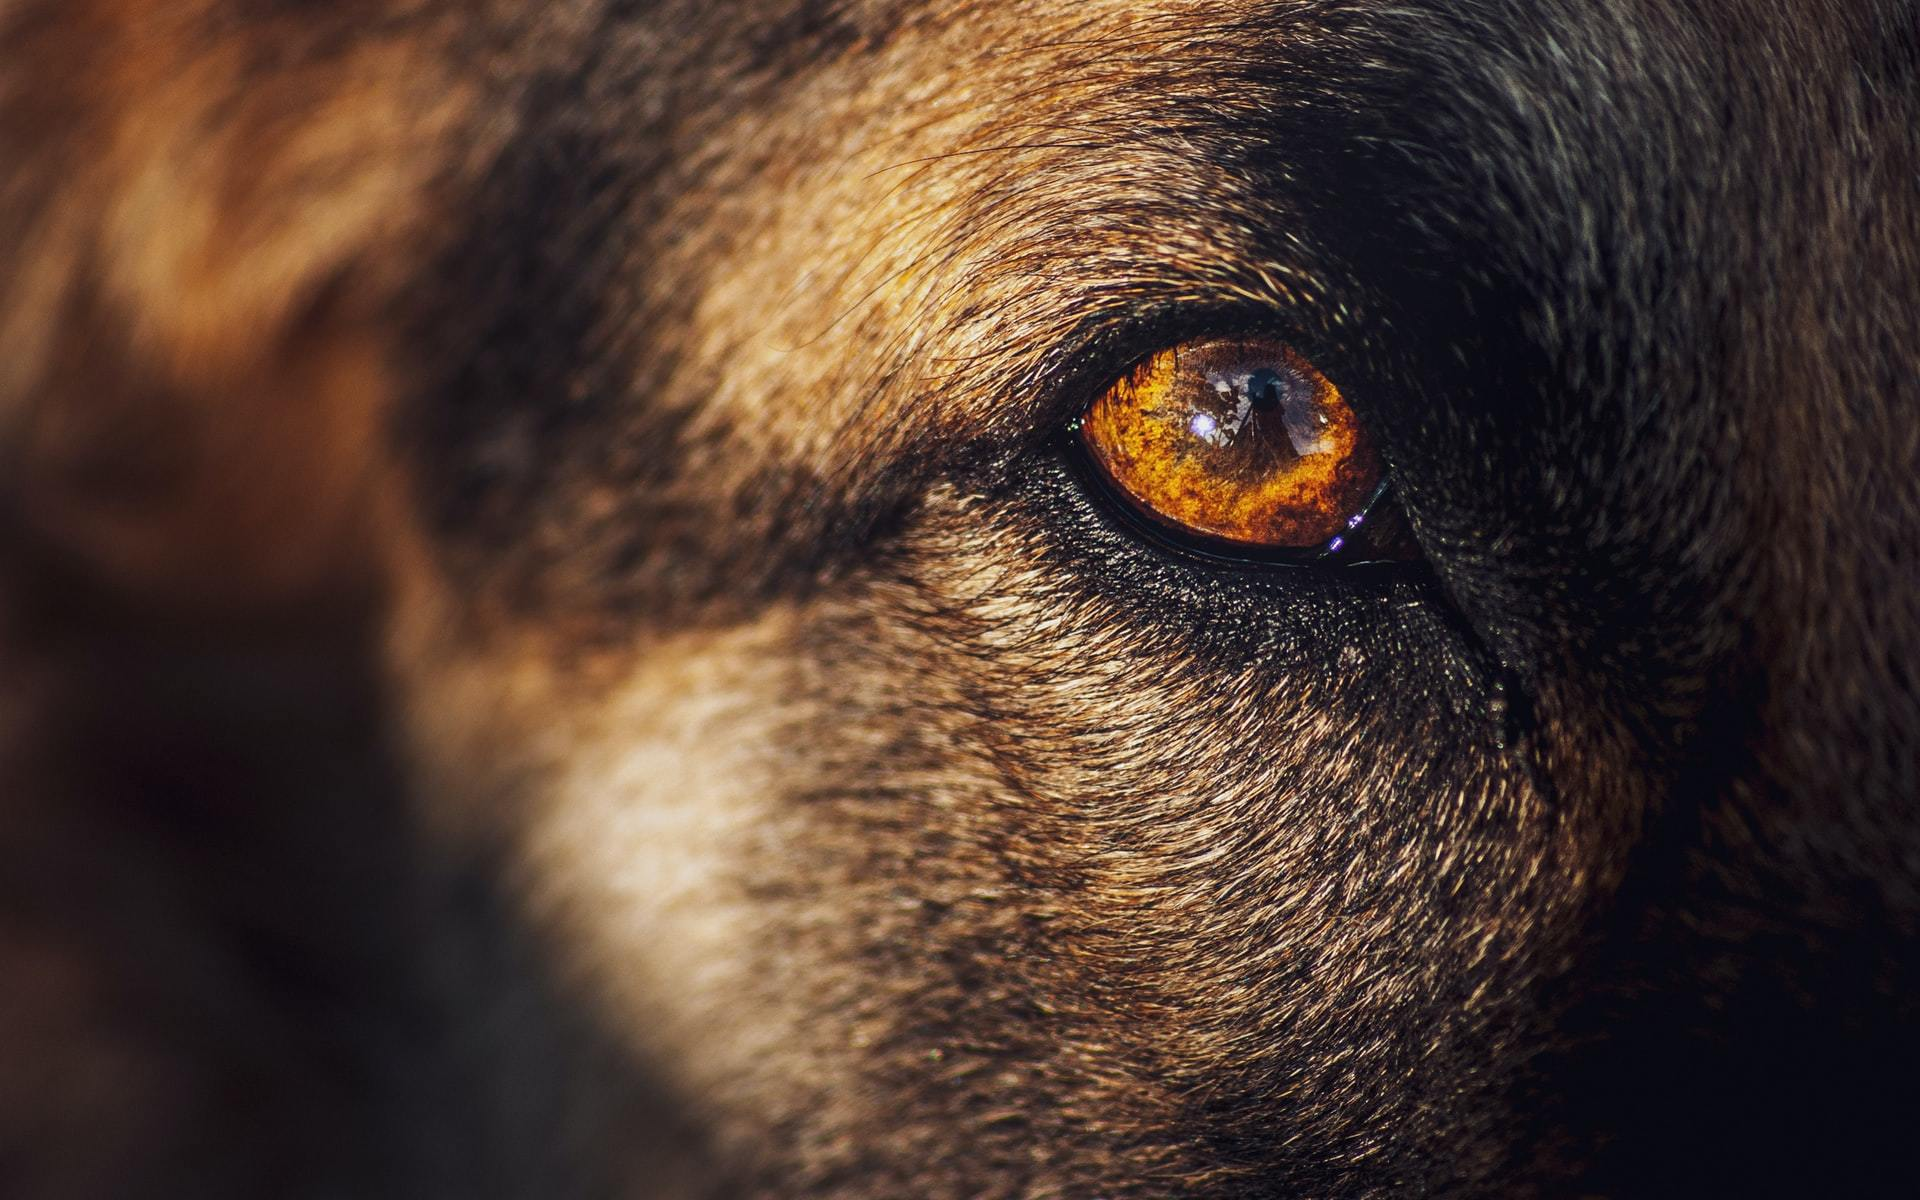 dog eye changes